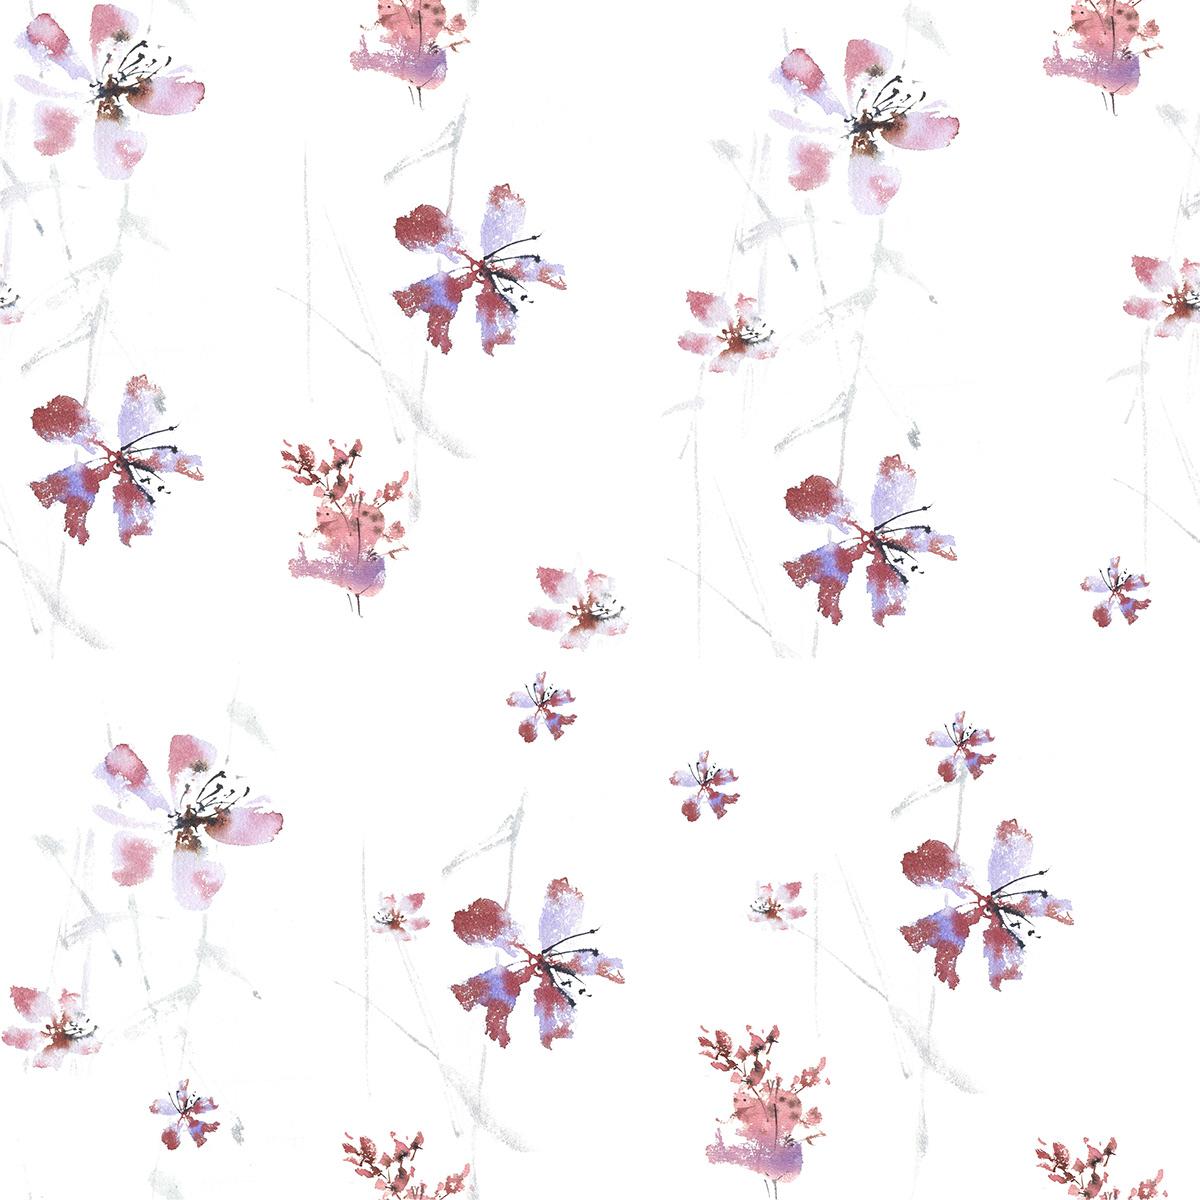 artist botanic creative Flowers ILLUSTRATION  Illustrator pattern watercolor